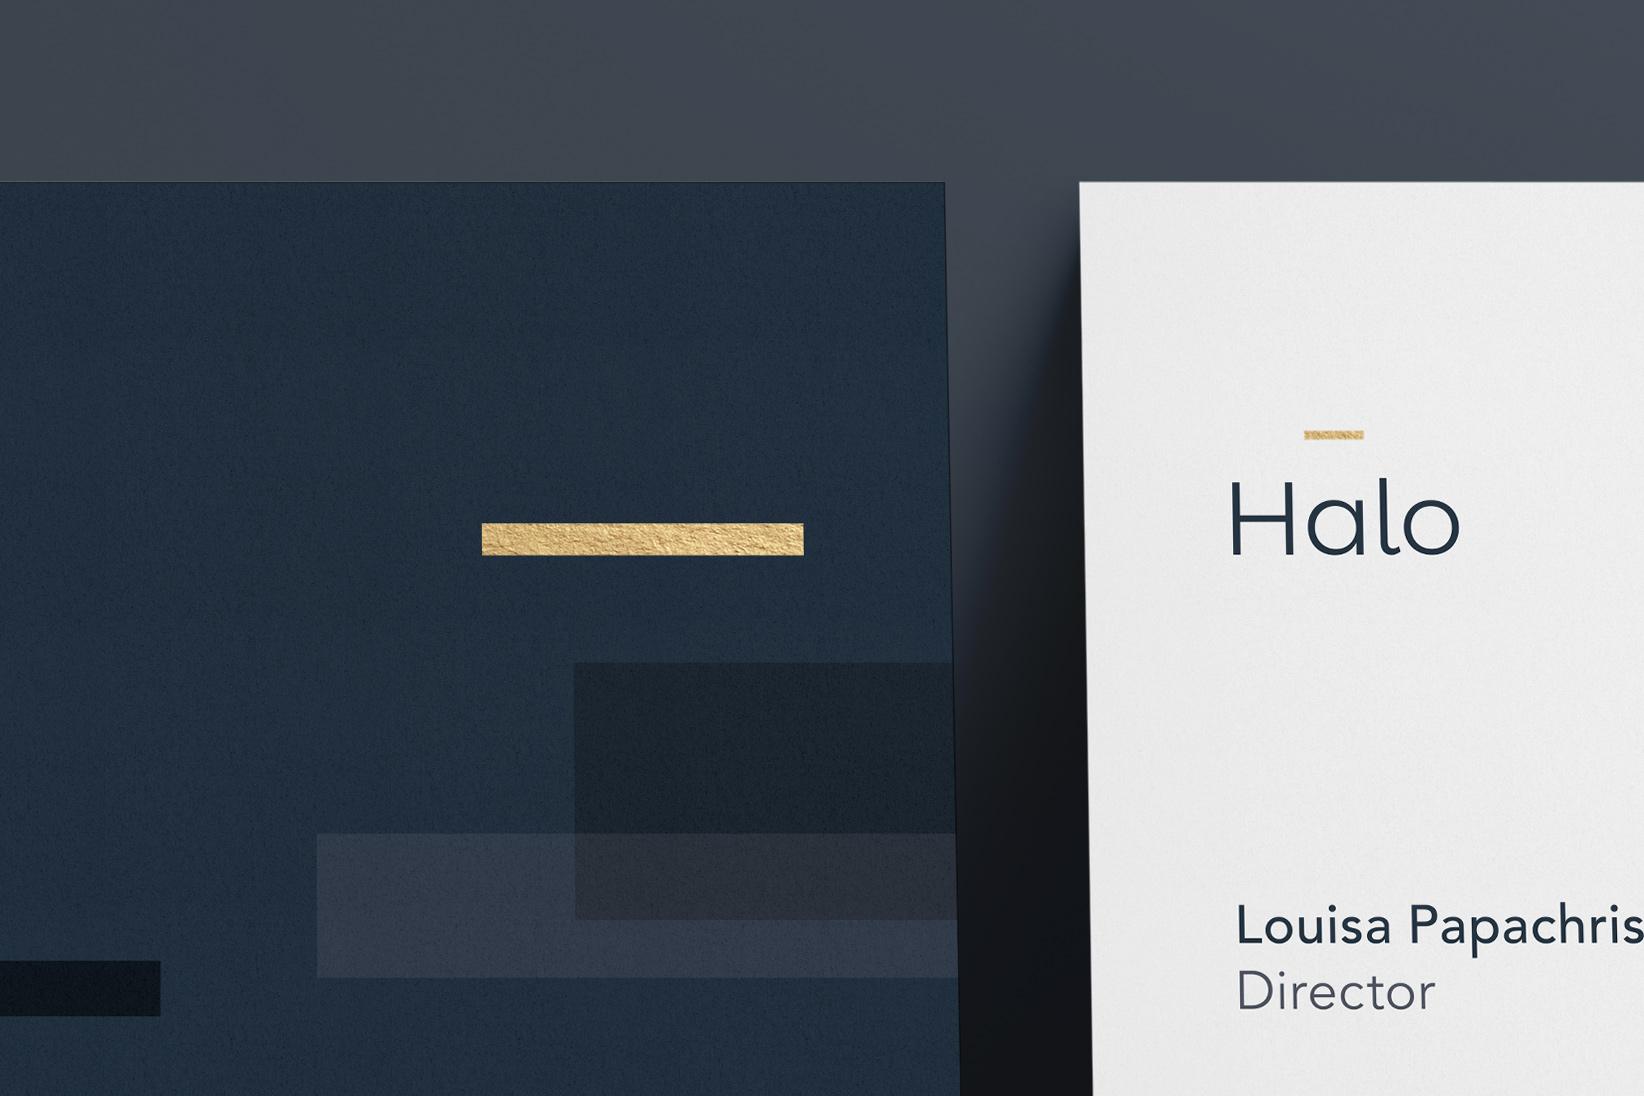 Halo-business-cards-crop.jpg